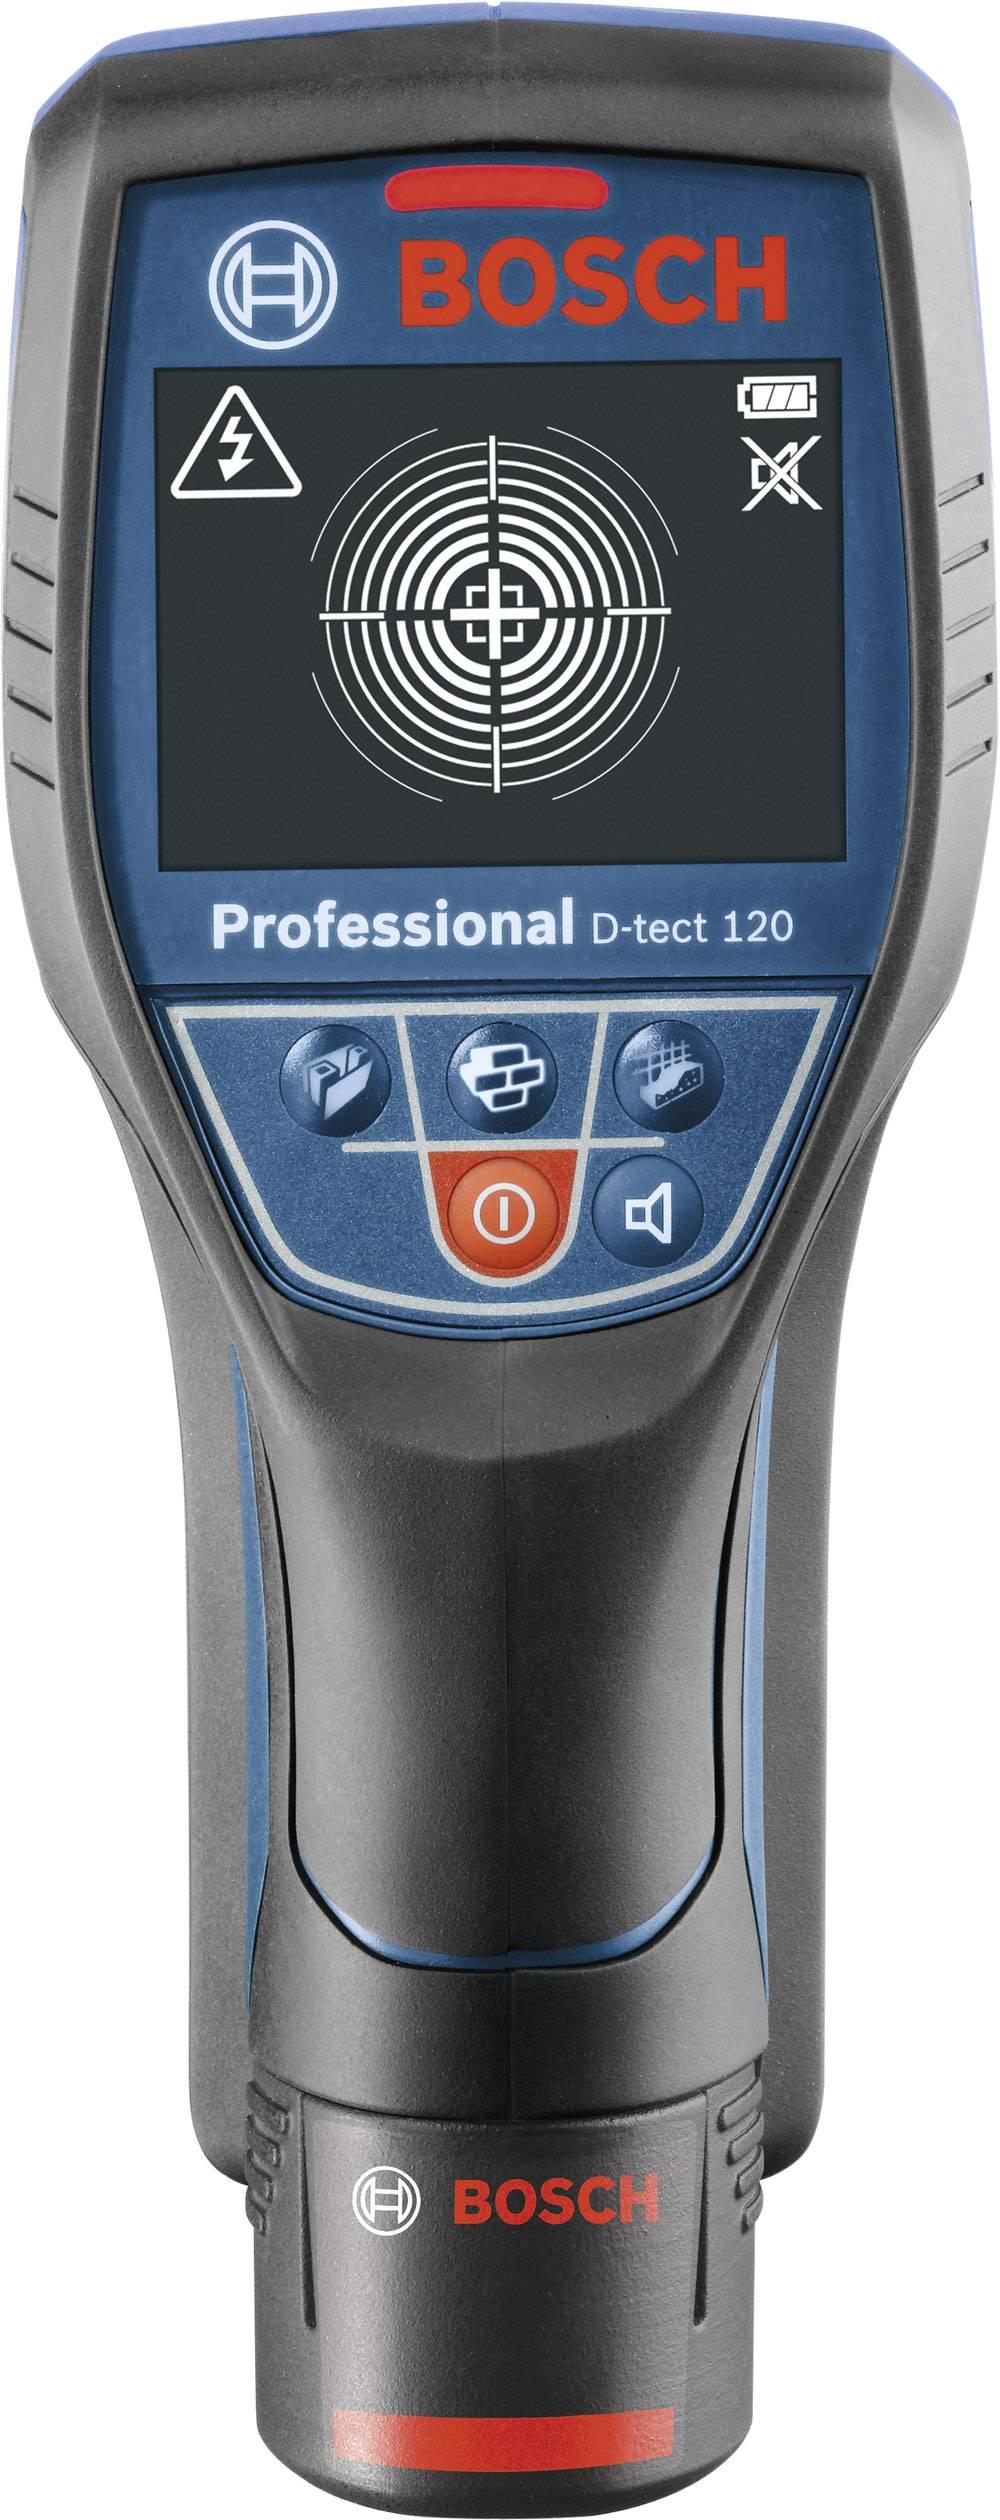 Bosch Professional D-tect 120 0601081301